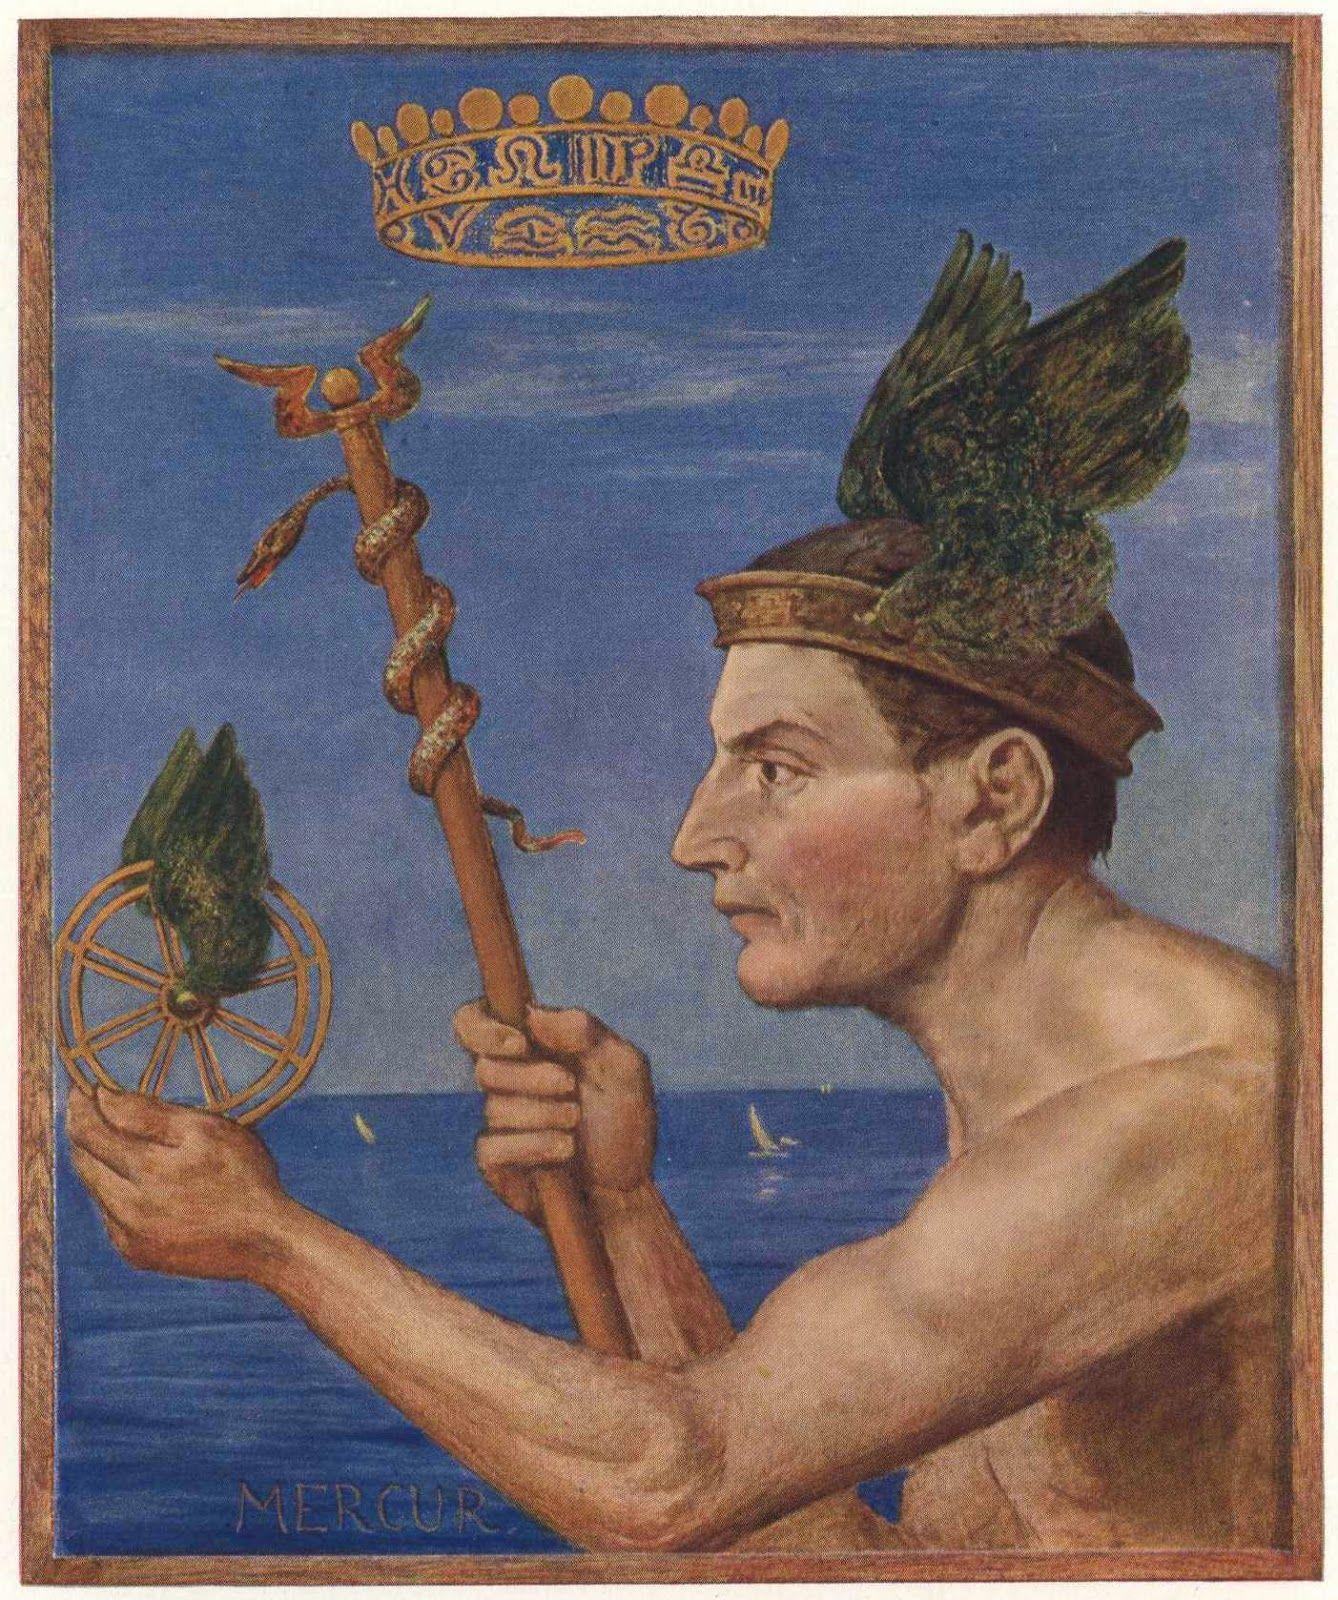 Alternative Right: MERCURY RISING: THE LIFE & WRITINGS OF JULIUS EVOLA